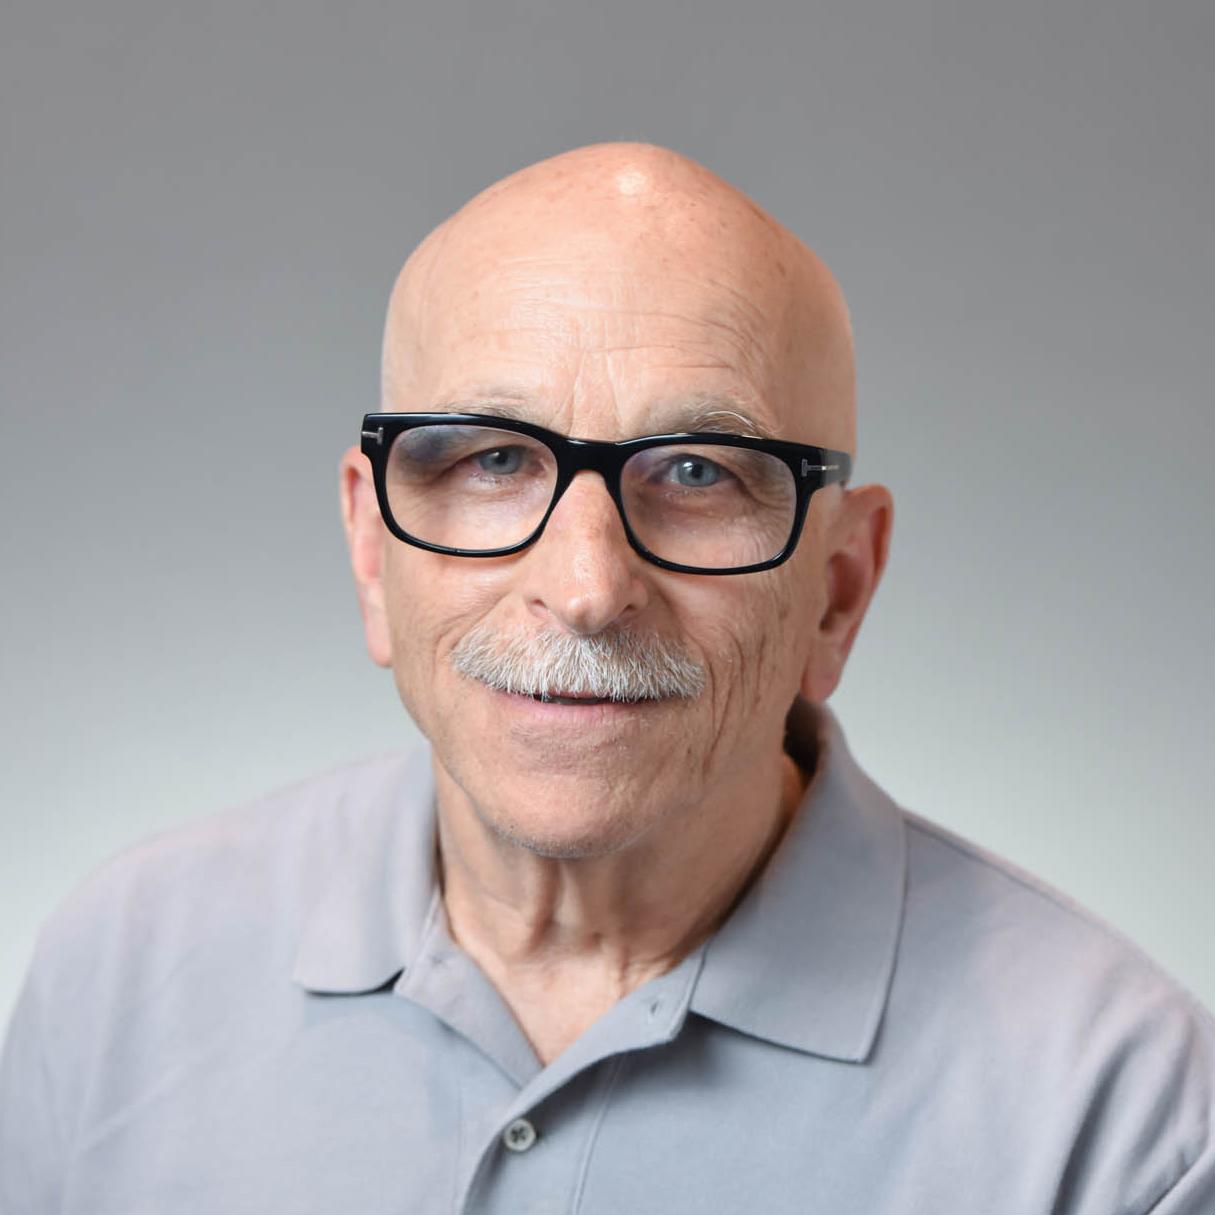 Daniel Levin, DDS, FACS